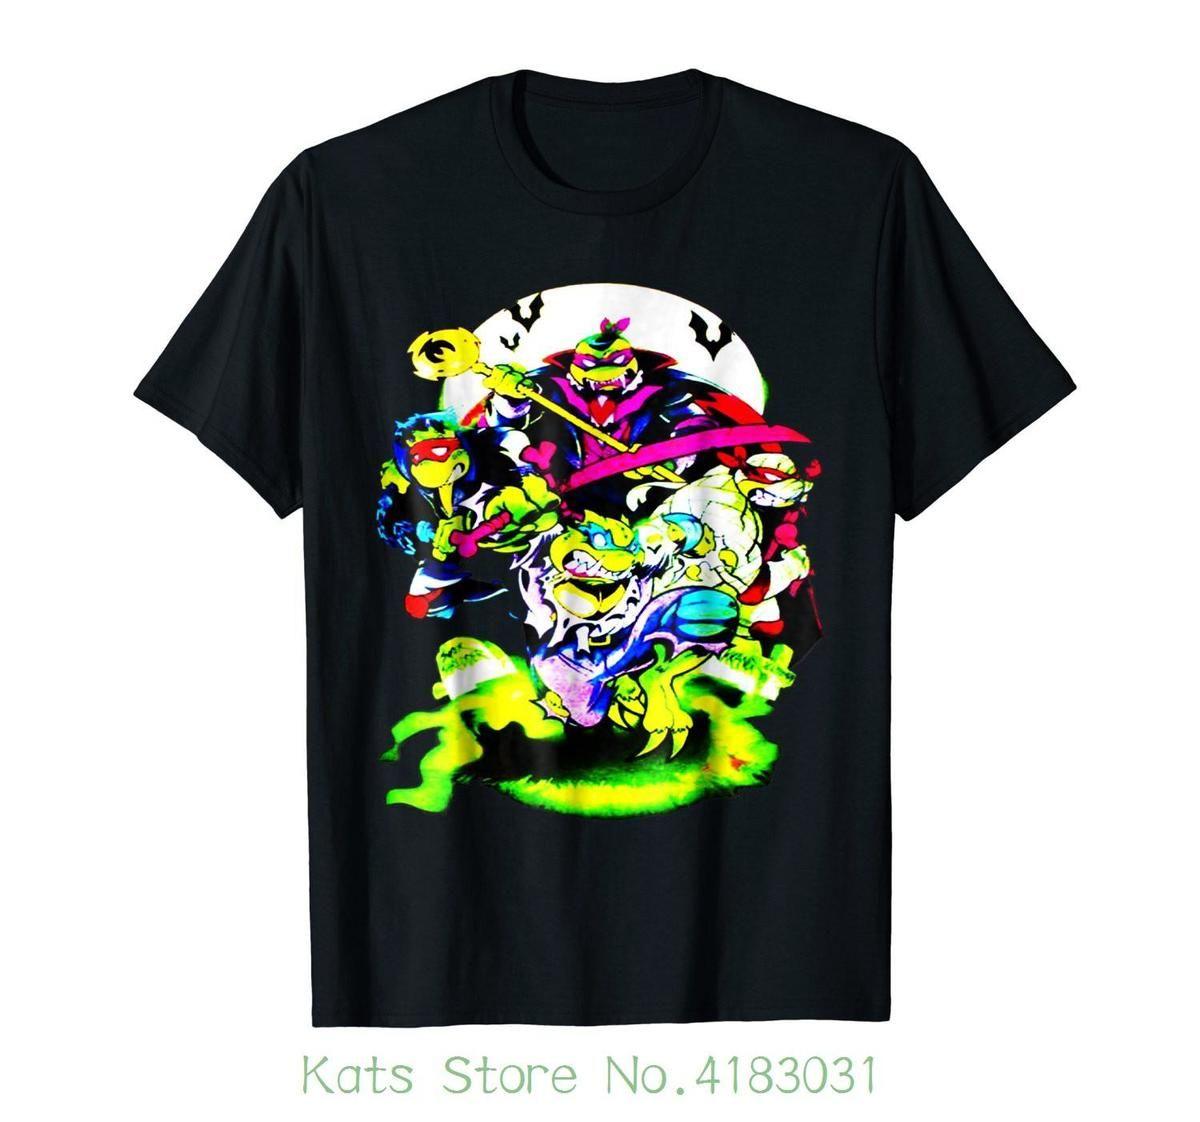 b5181c95 Shell Raisers Retro 80s Cartoon Turtles Funny T Shirt Summer Fashion Funny  T Shirts For Guys Fashion T Shirts From Pxue3209, $12.79  DHgate.Com